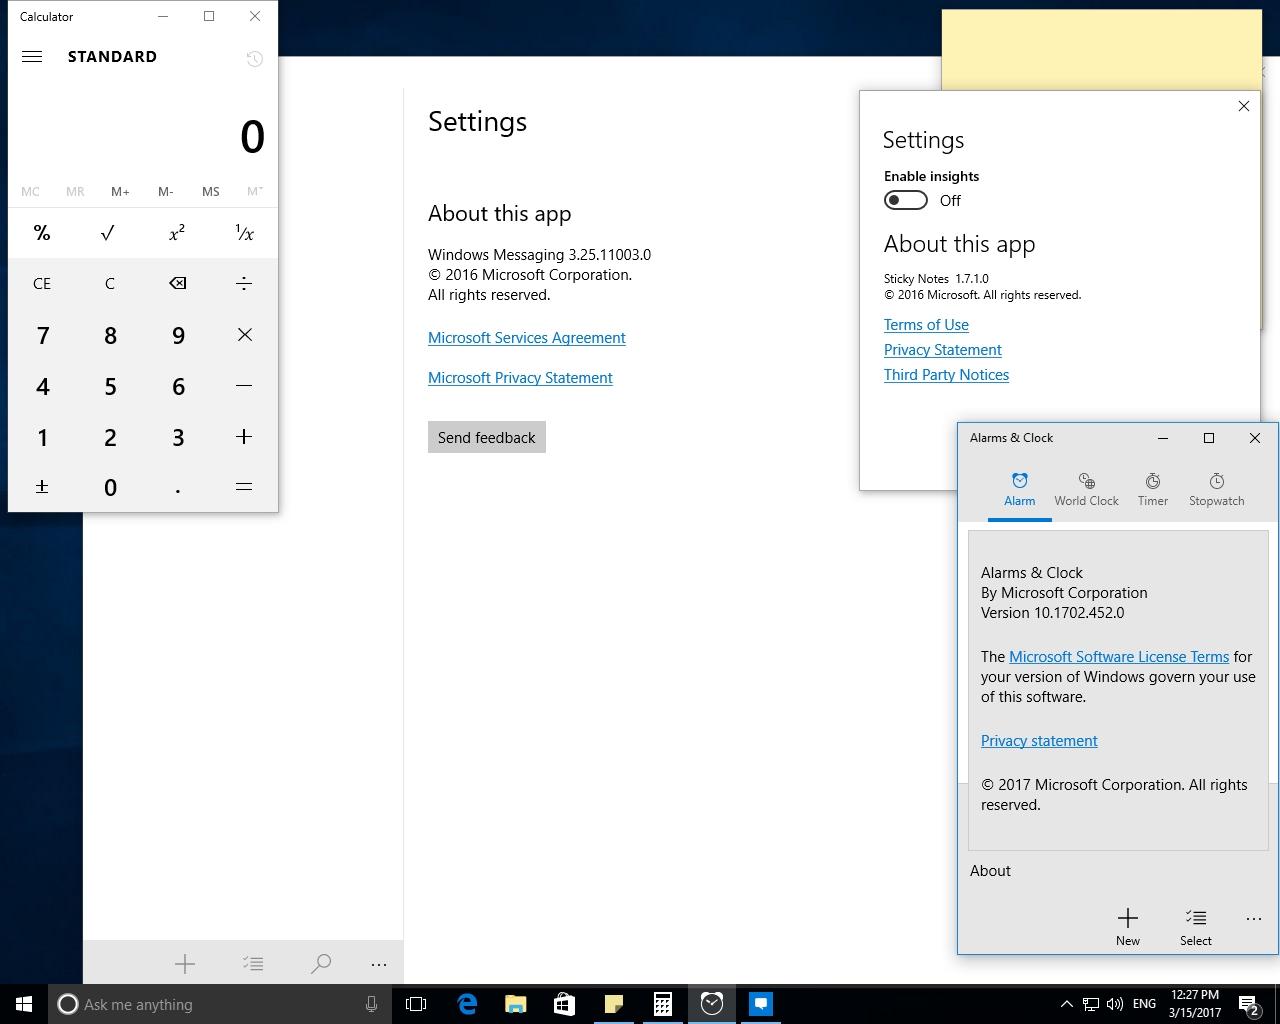 windows 10 version 1607 with update 14393.726